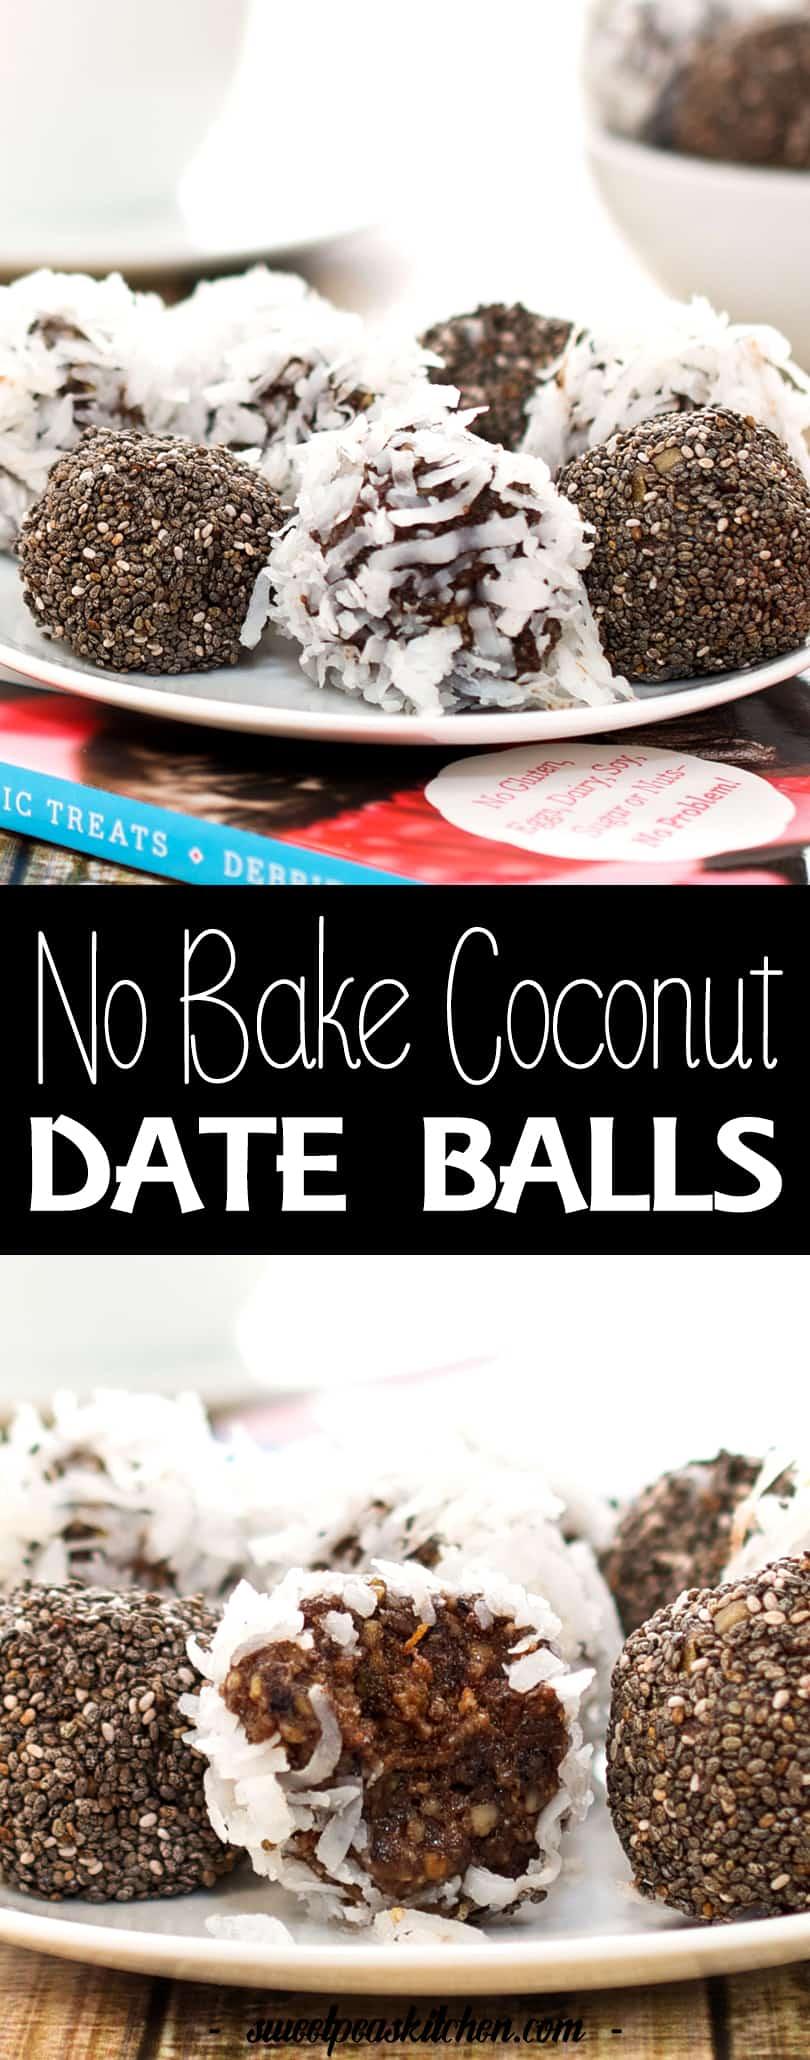 No Bake Coconut Date Balls